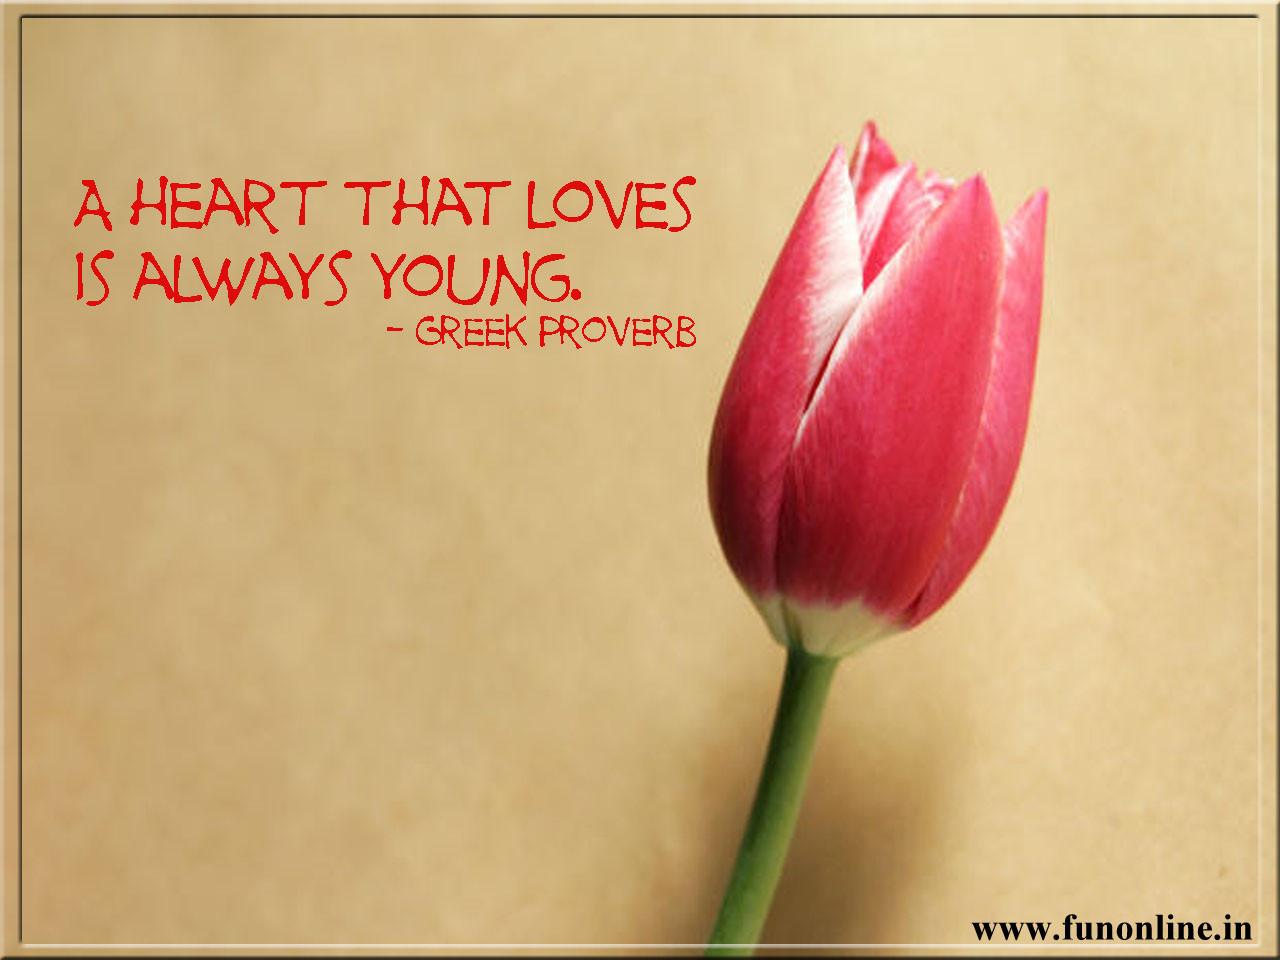 love quotes love quotes love quotes love quotes love quotes love 1280x960